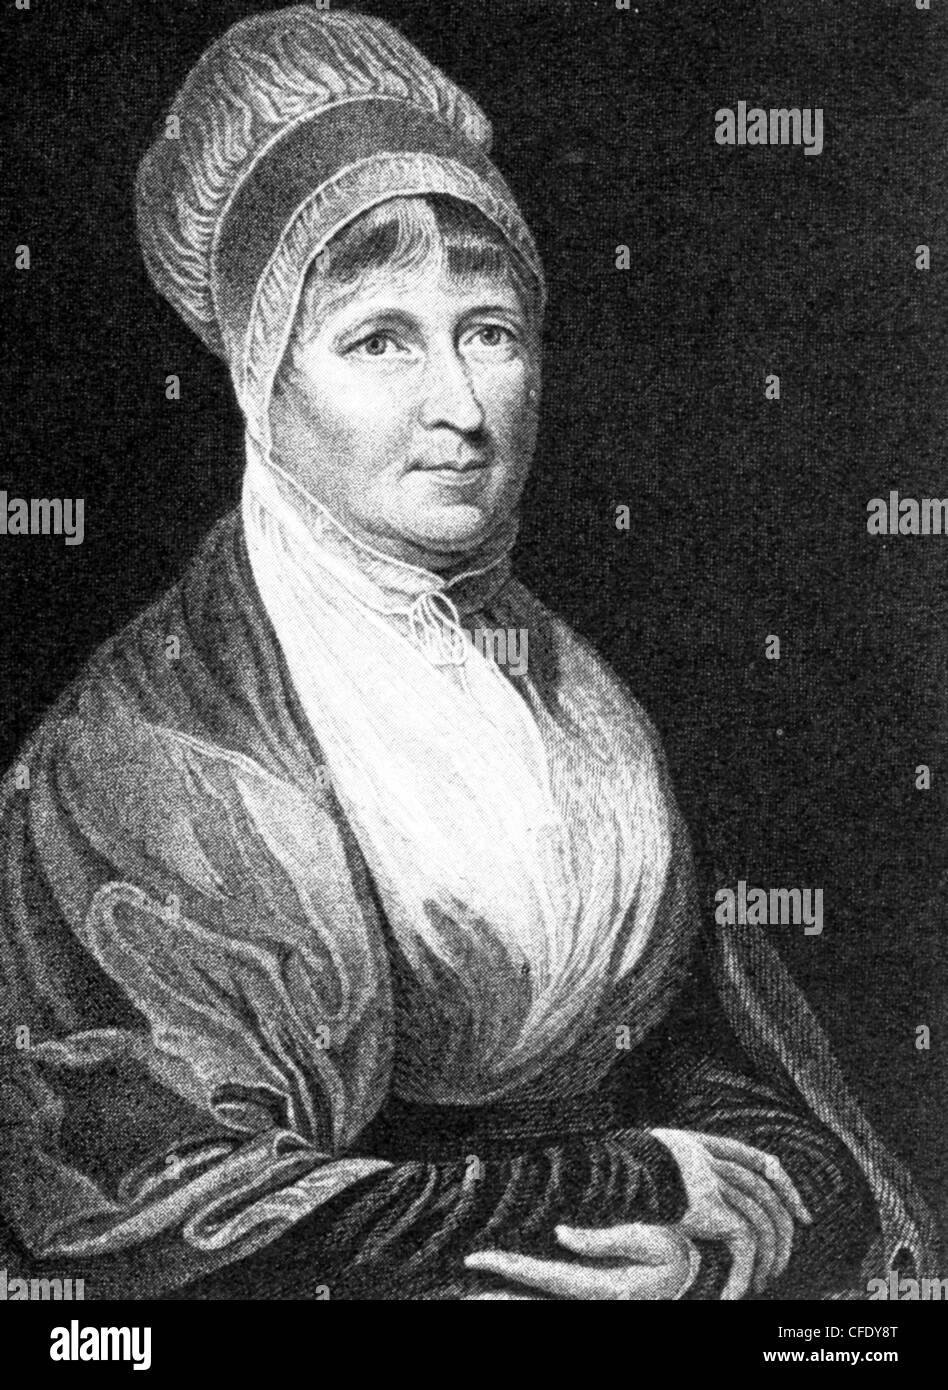 ELIZABETH FRY (1780-1845) English prison reformer - Stock Image